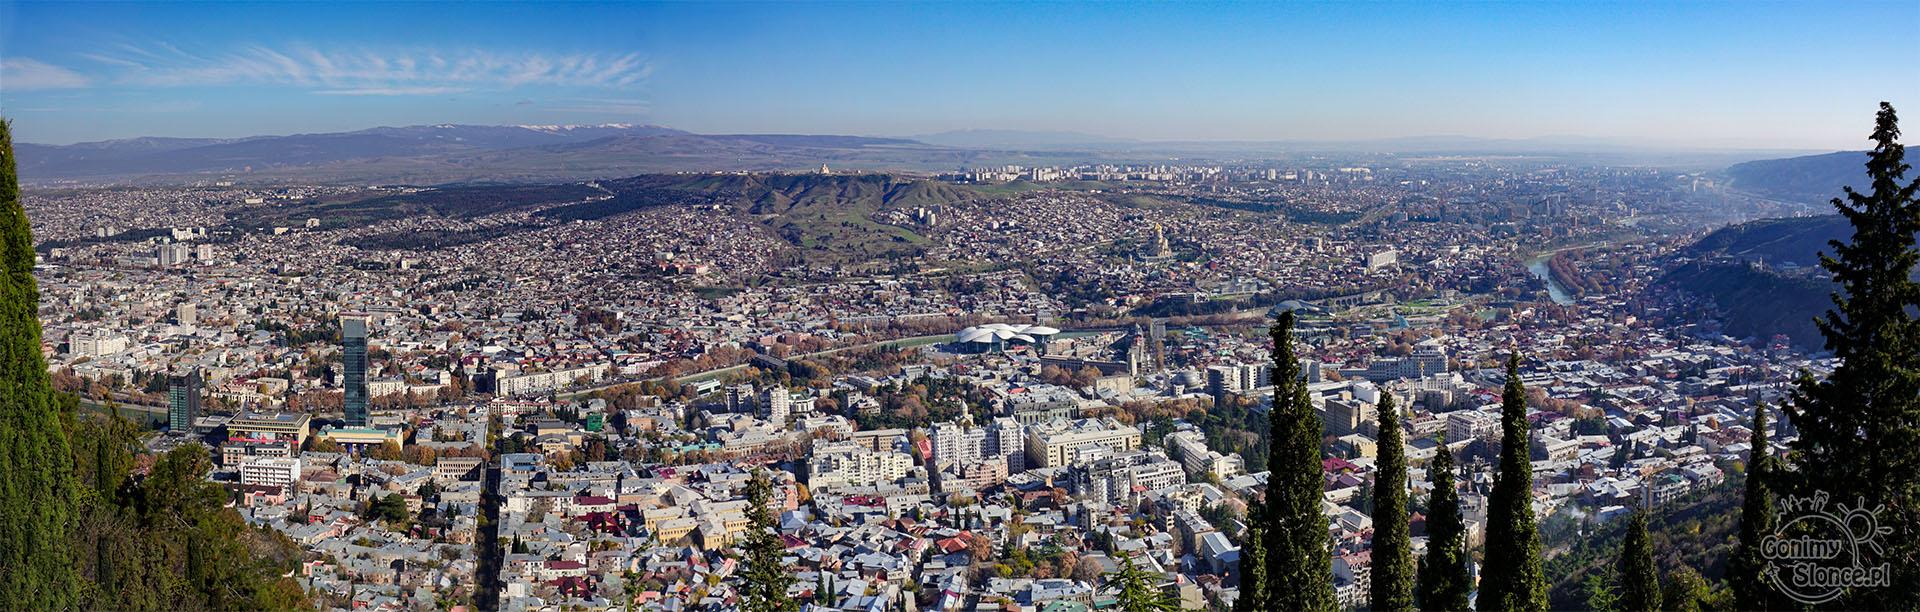 Festiwal Młodego Wina w Tbilisi - panorama Tbilisi | Mtatsminda